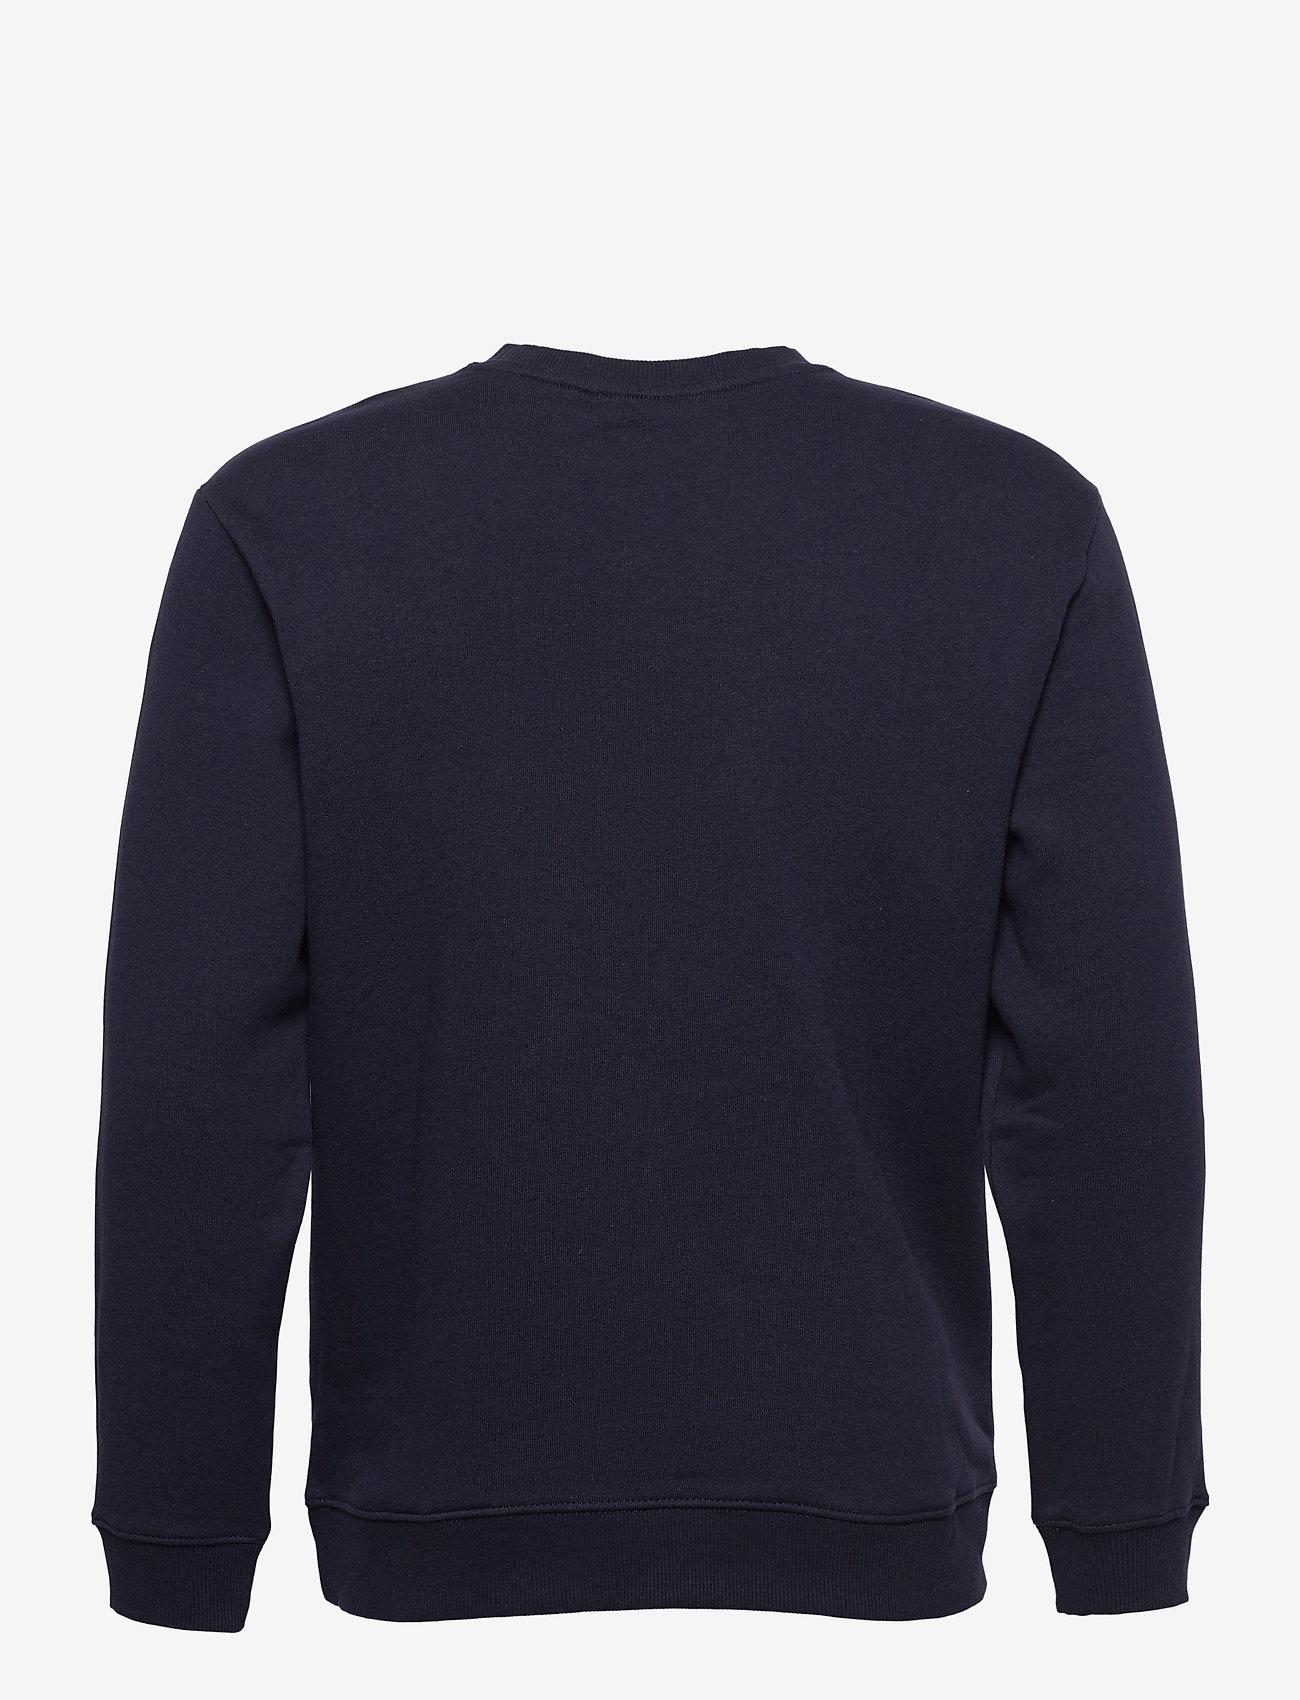 Lee Jeans - BASIC CREW LOGO SWS - tops - midnight navy - 1